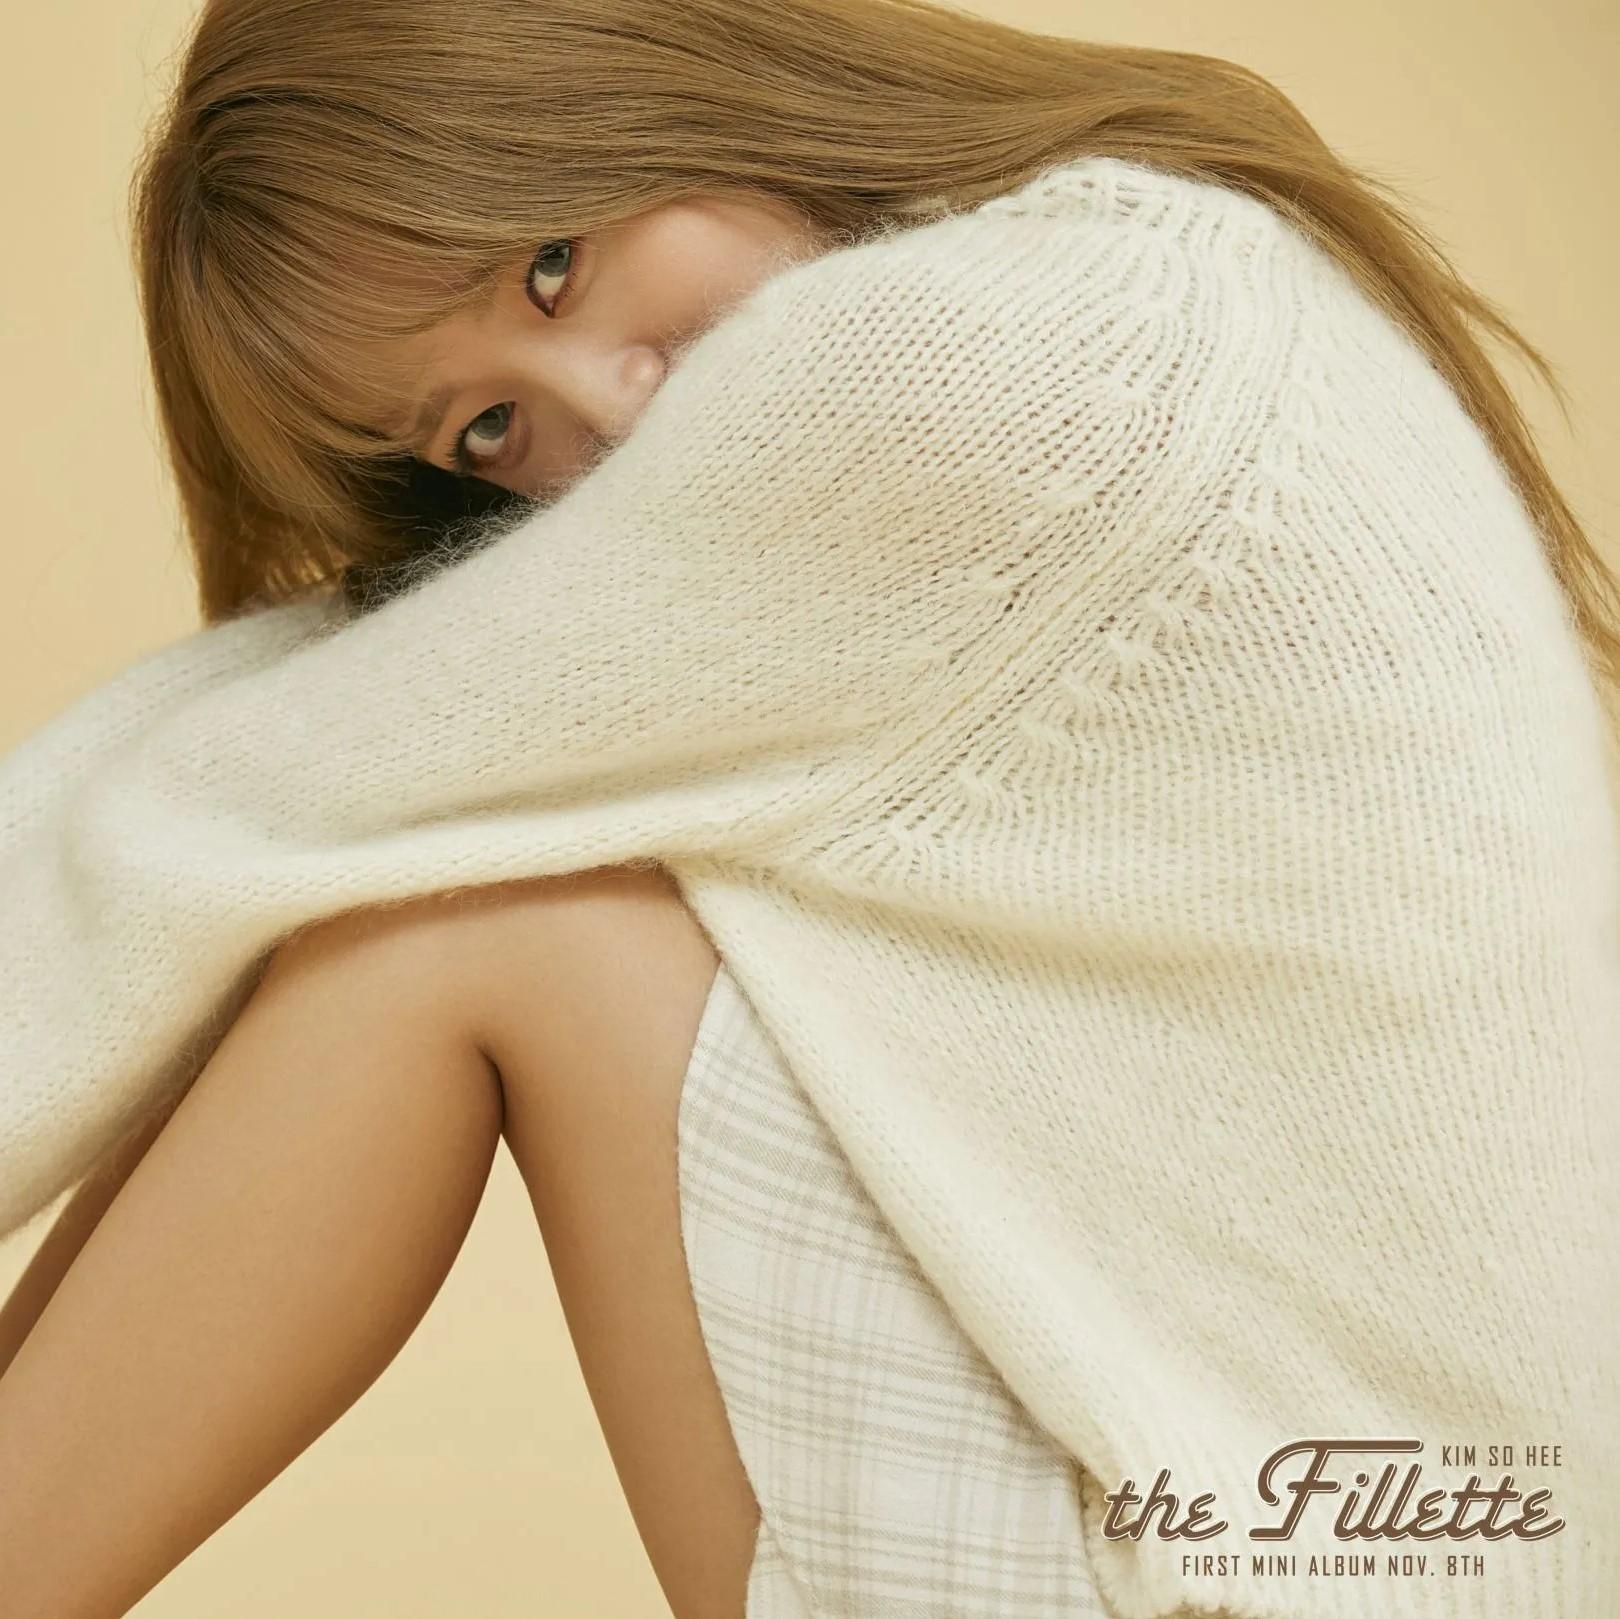 The Fillette - Kim So Hee